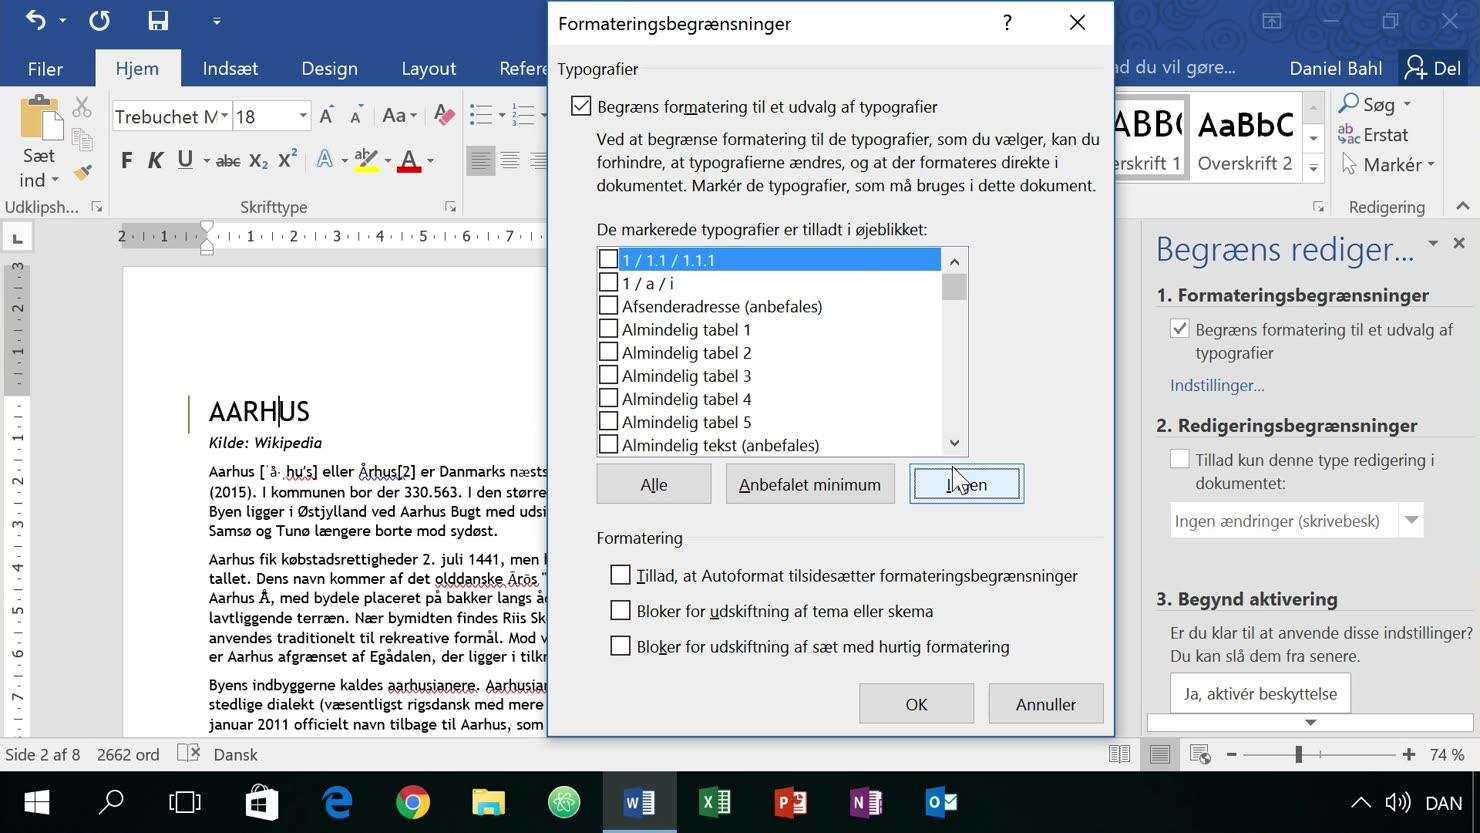 Beskyttet dokument: Lås et dokuments formatering ned når du deler med andre